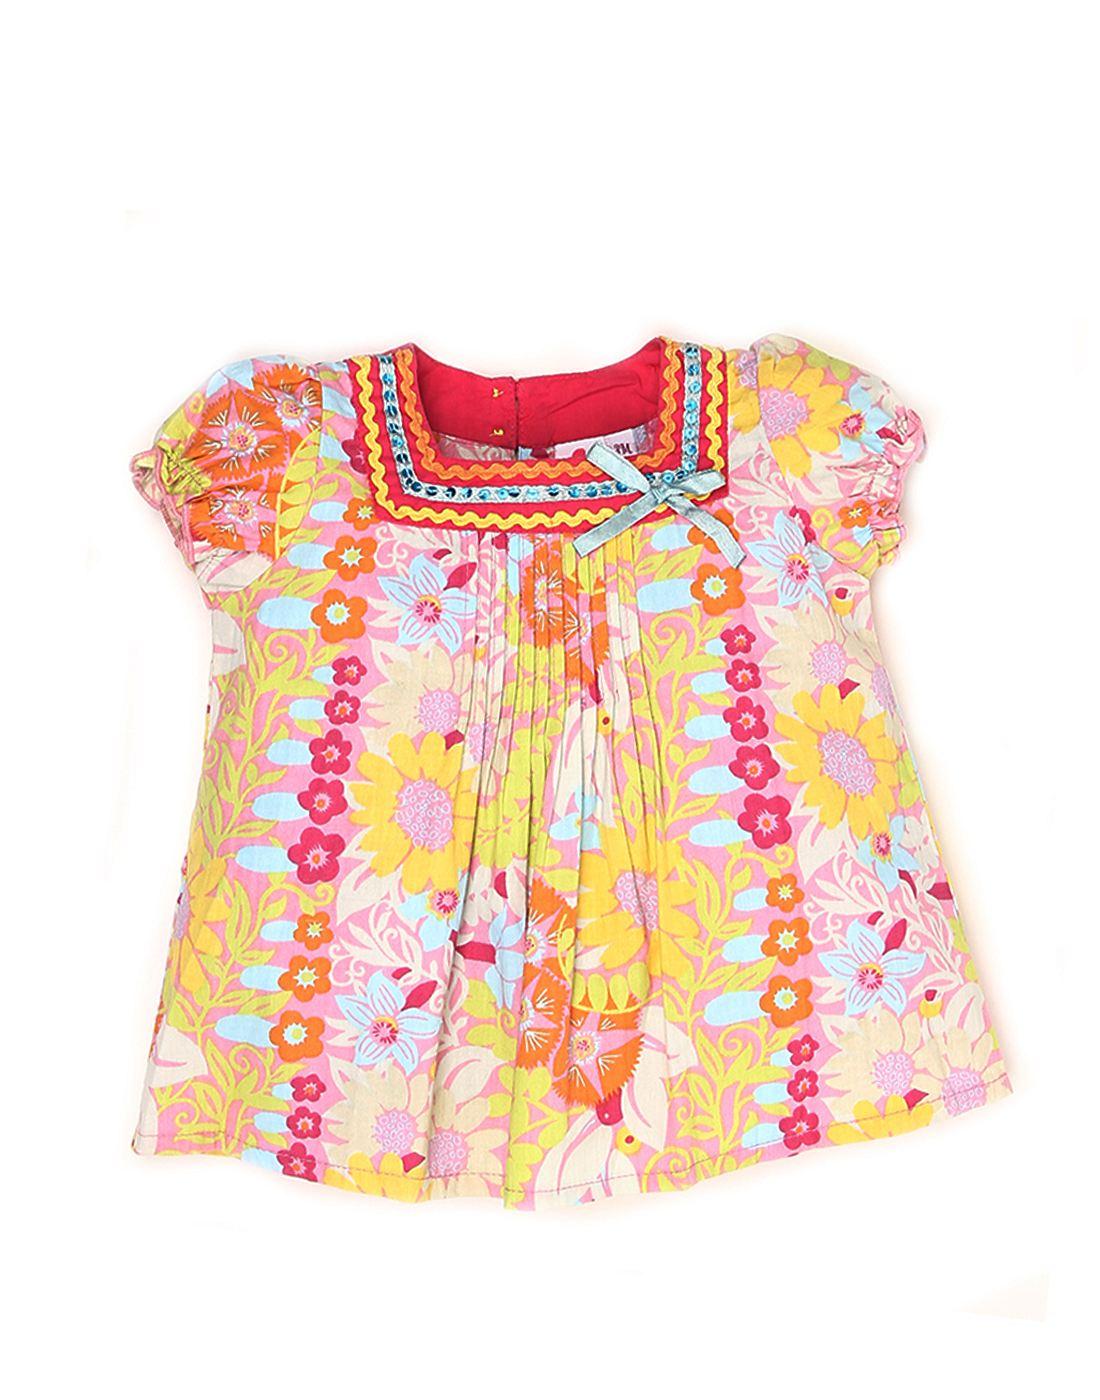 K.C.O 89 Girls Casual Printed Half Sleeve Dress